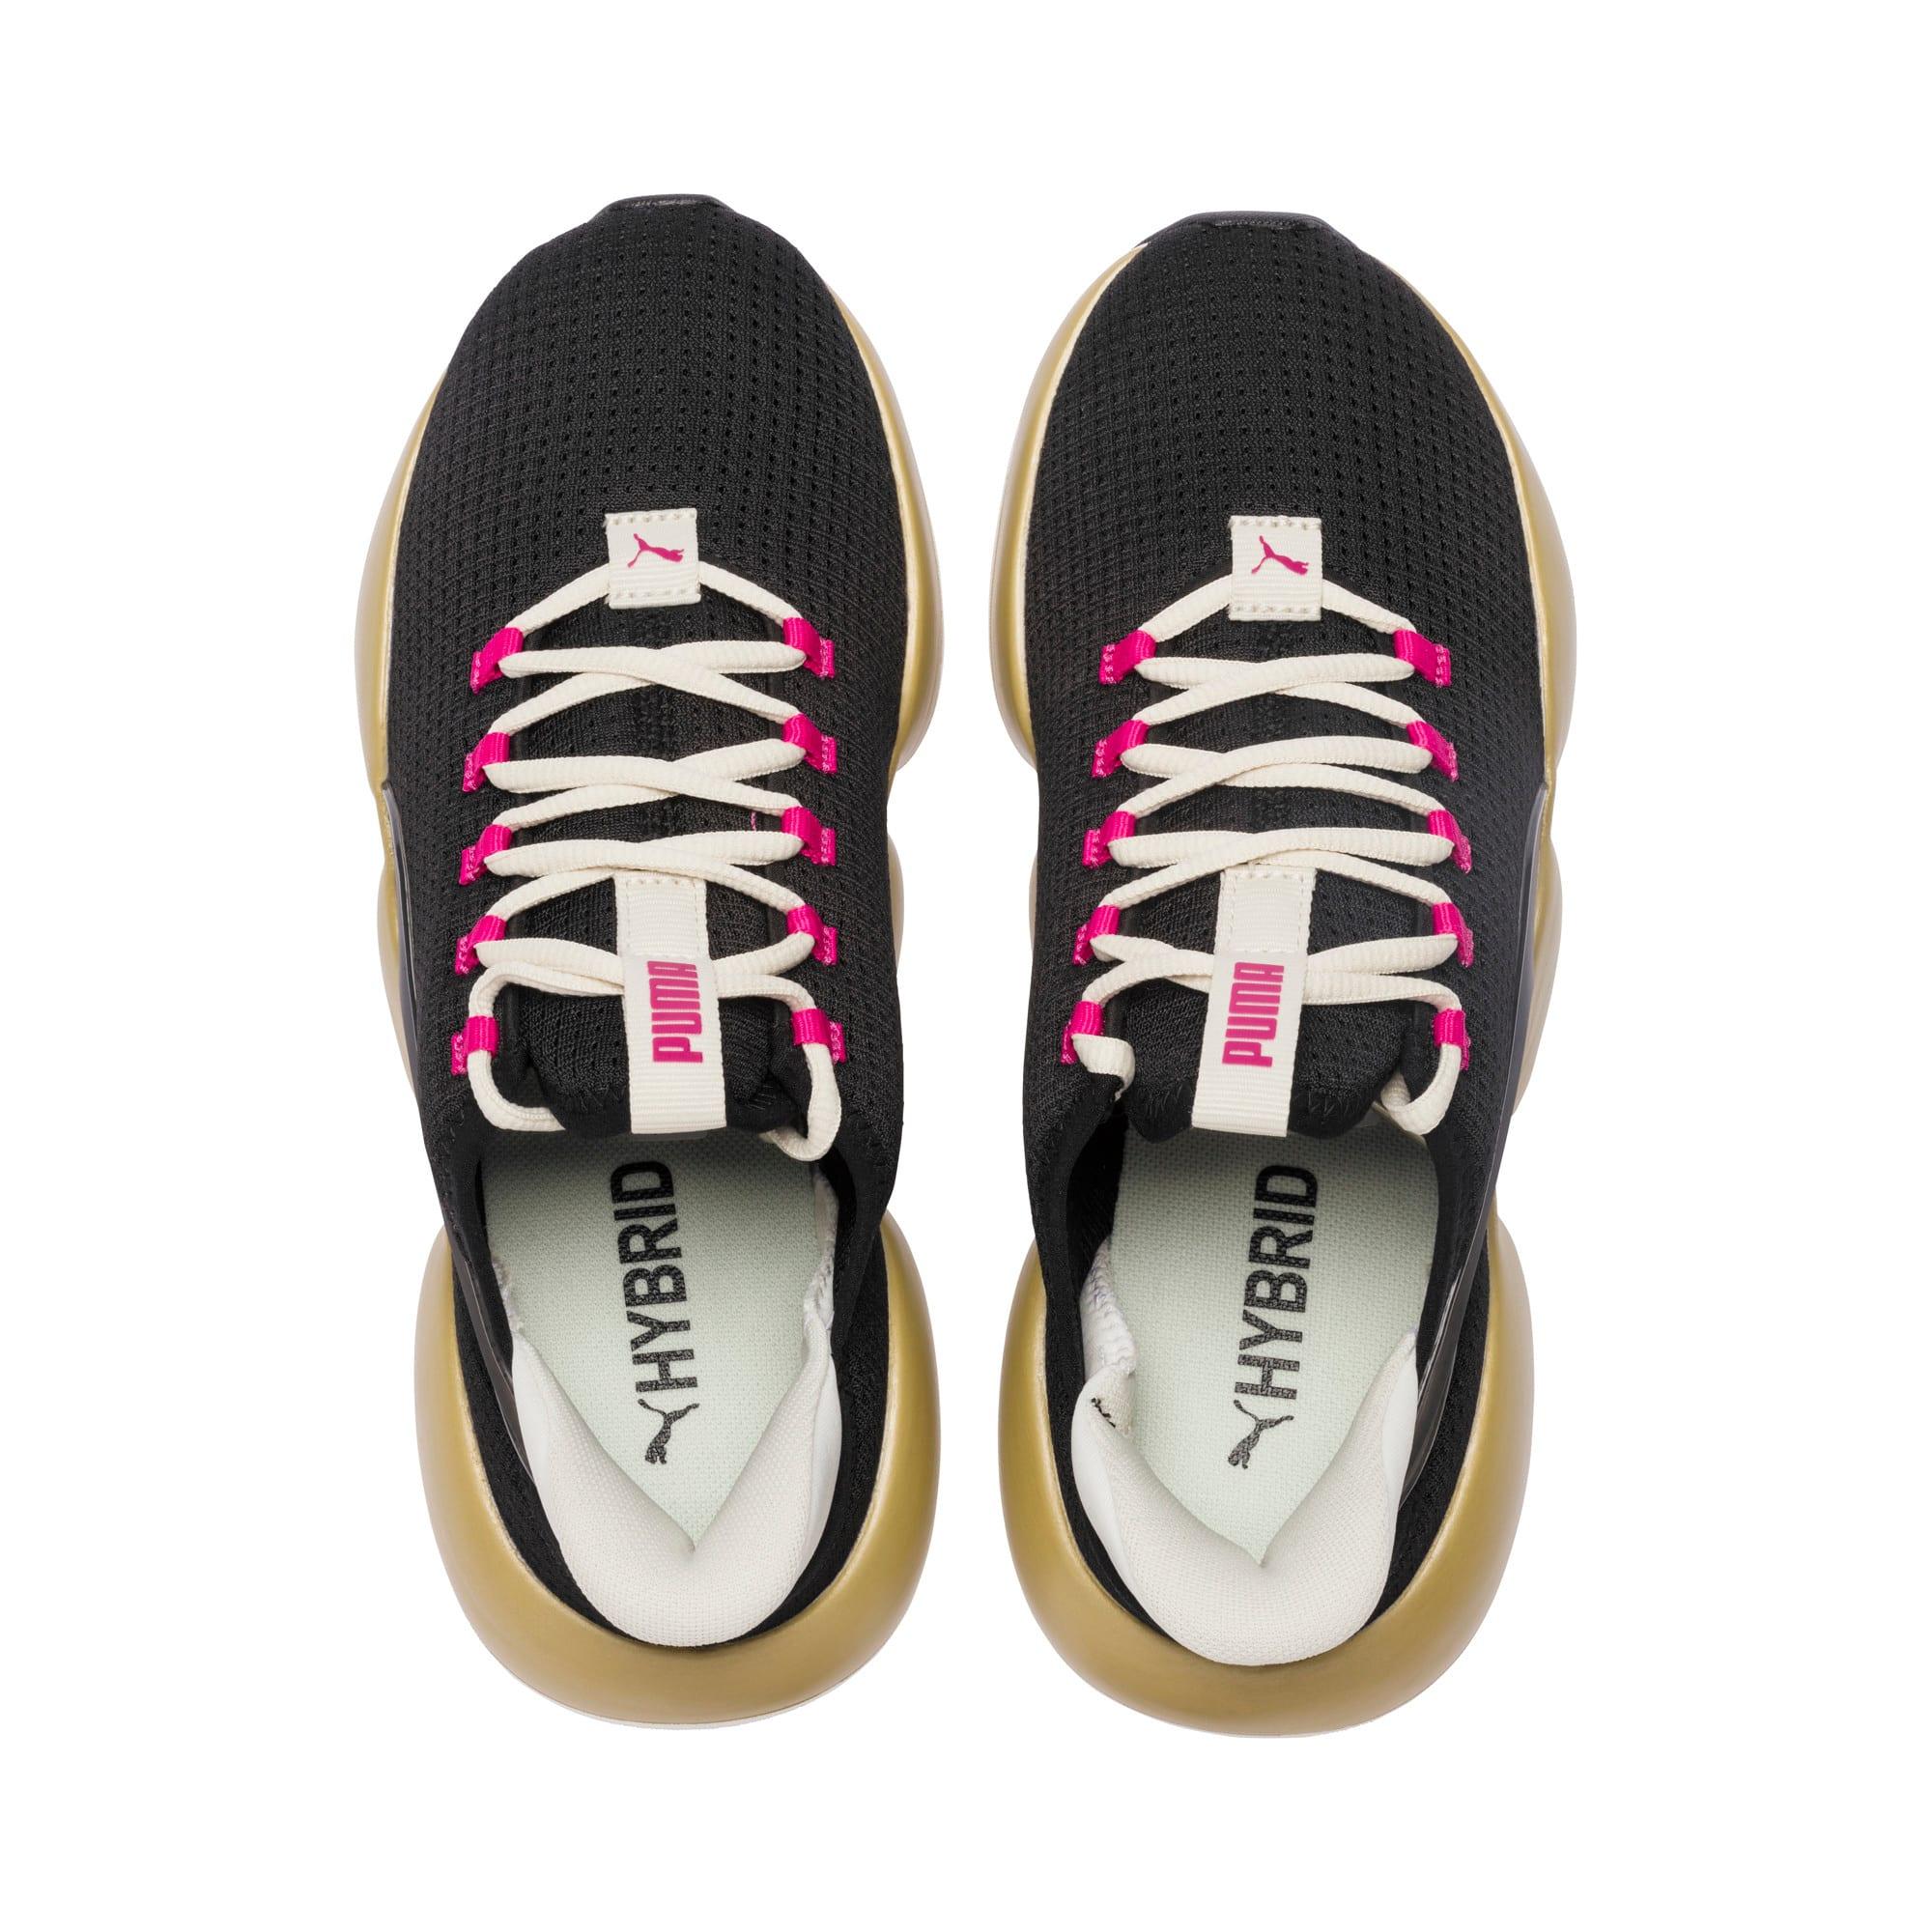 Thumbnail 6 of Mode XT Sweet Women's Training Shoes, Black- White-Purple, medium